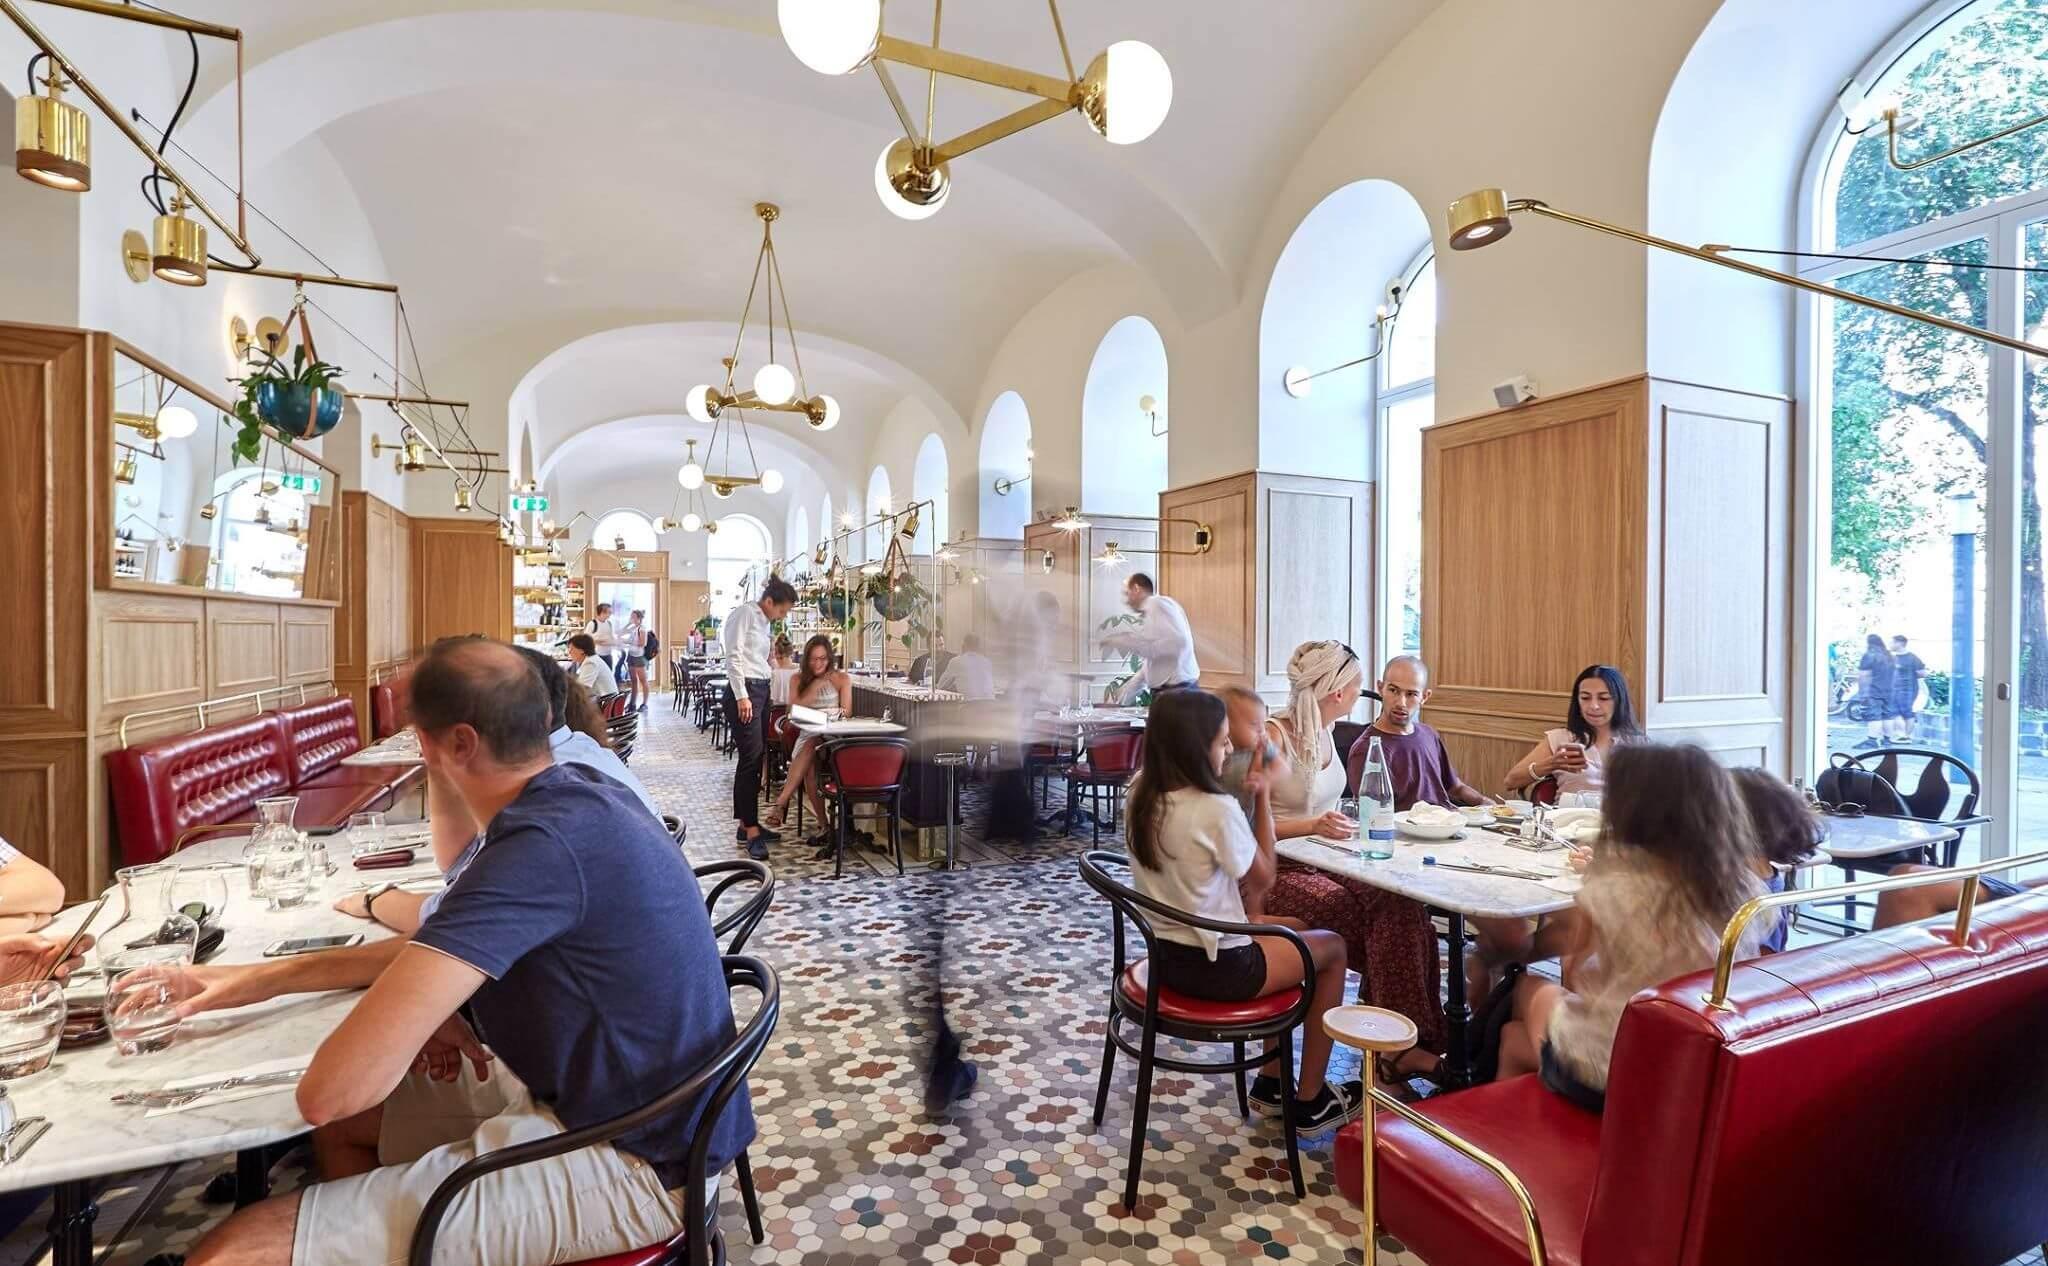 Borze Budapest מסעדת בורזה בבודפשט